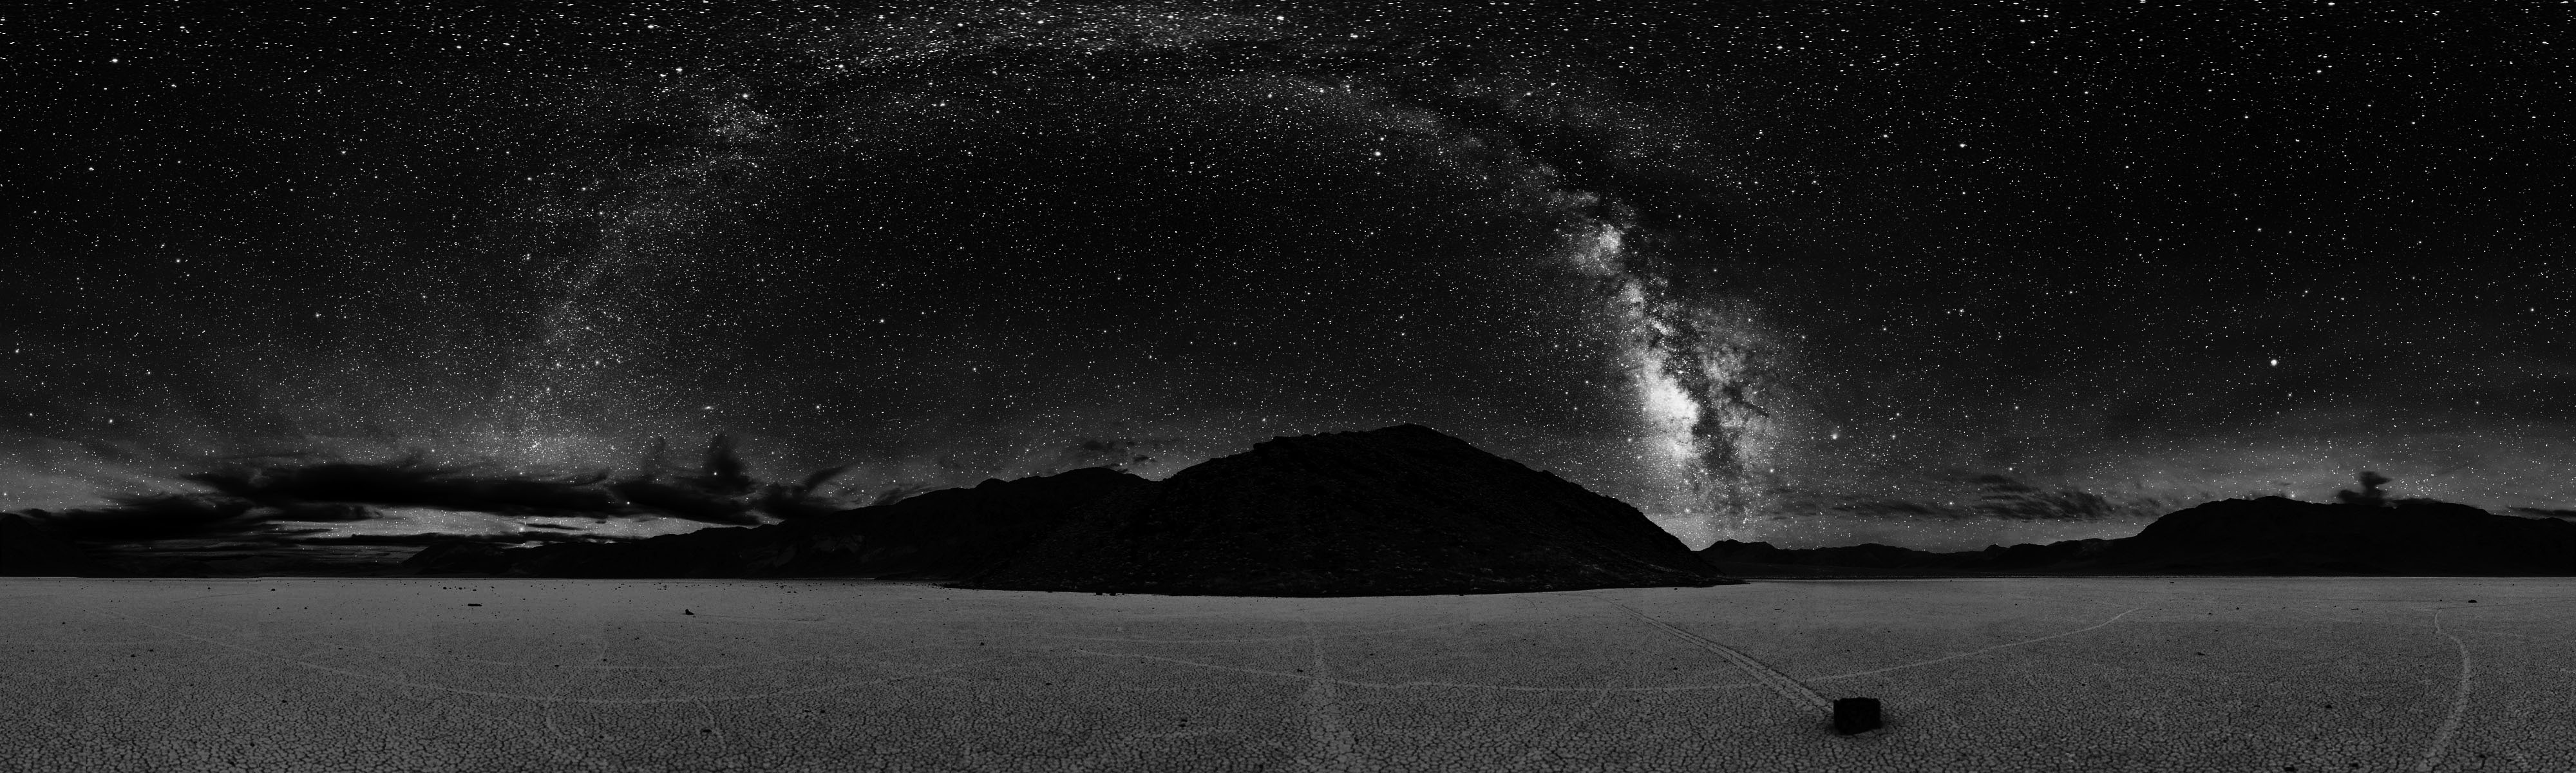 Milky Way Galaxy from Death Valley